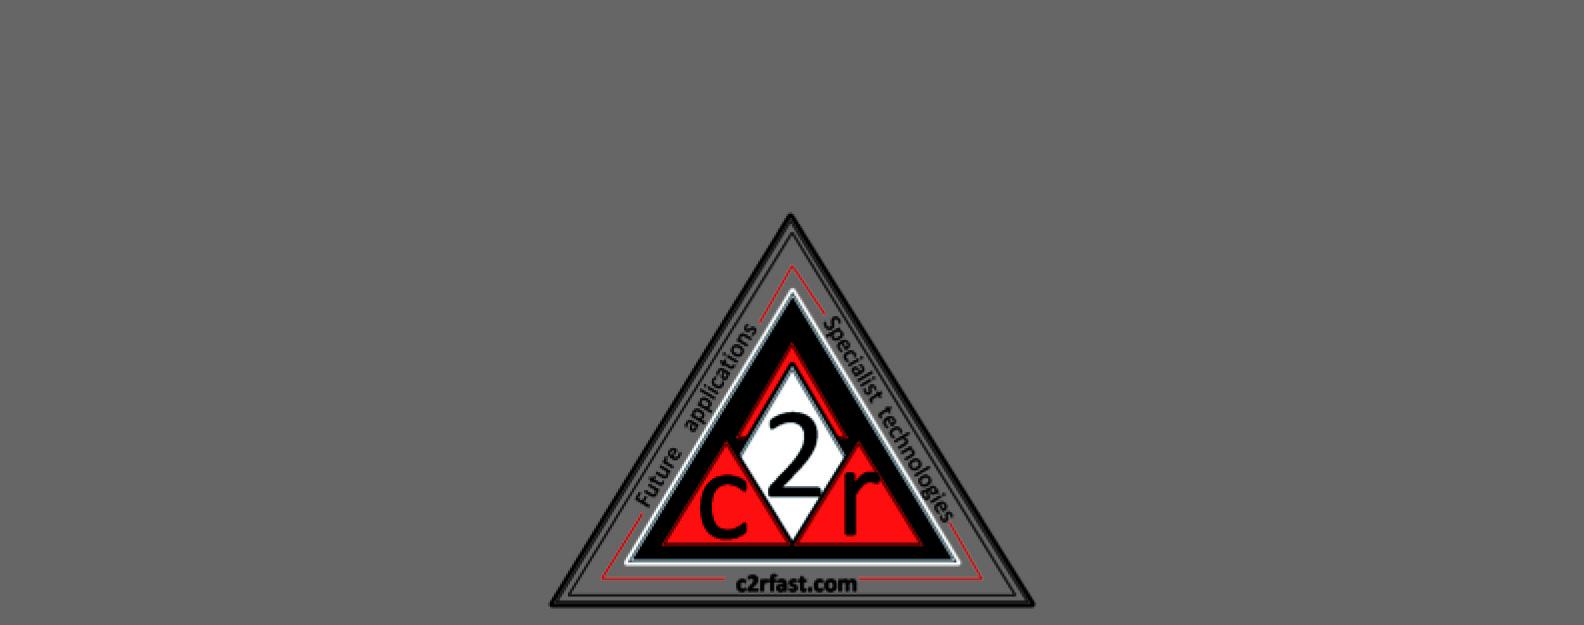 C2rfast